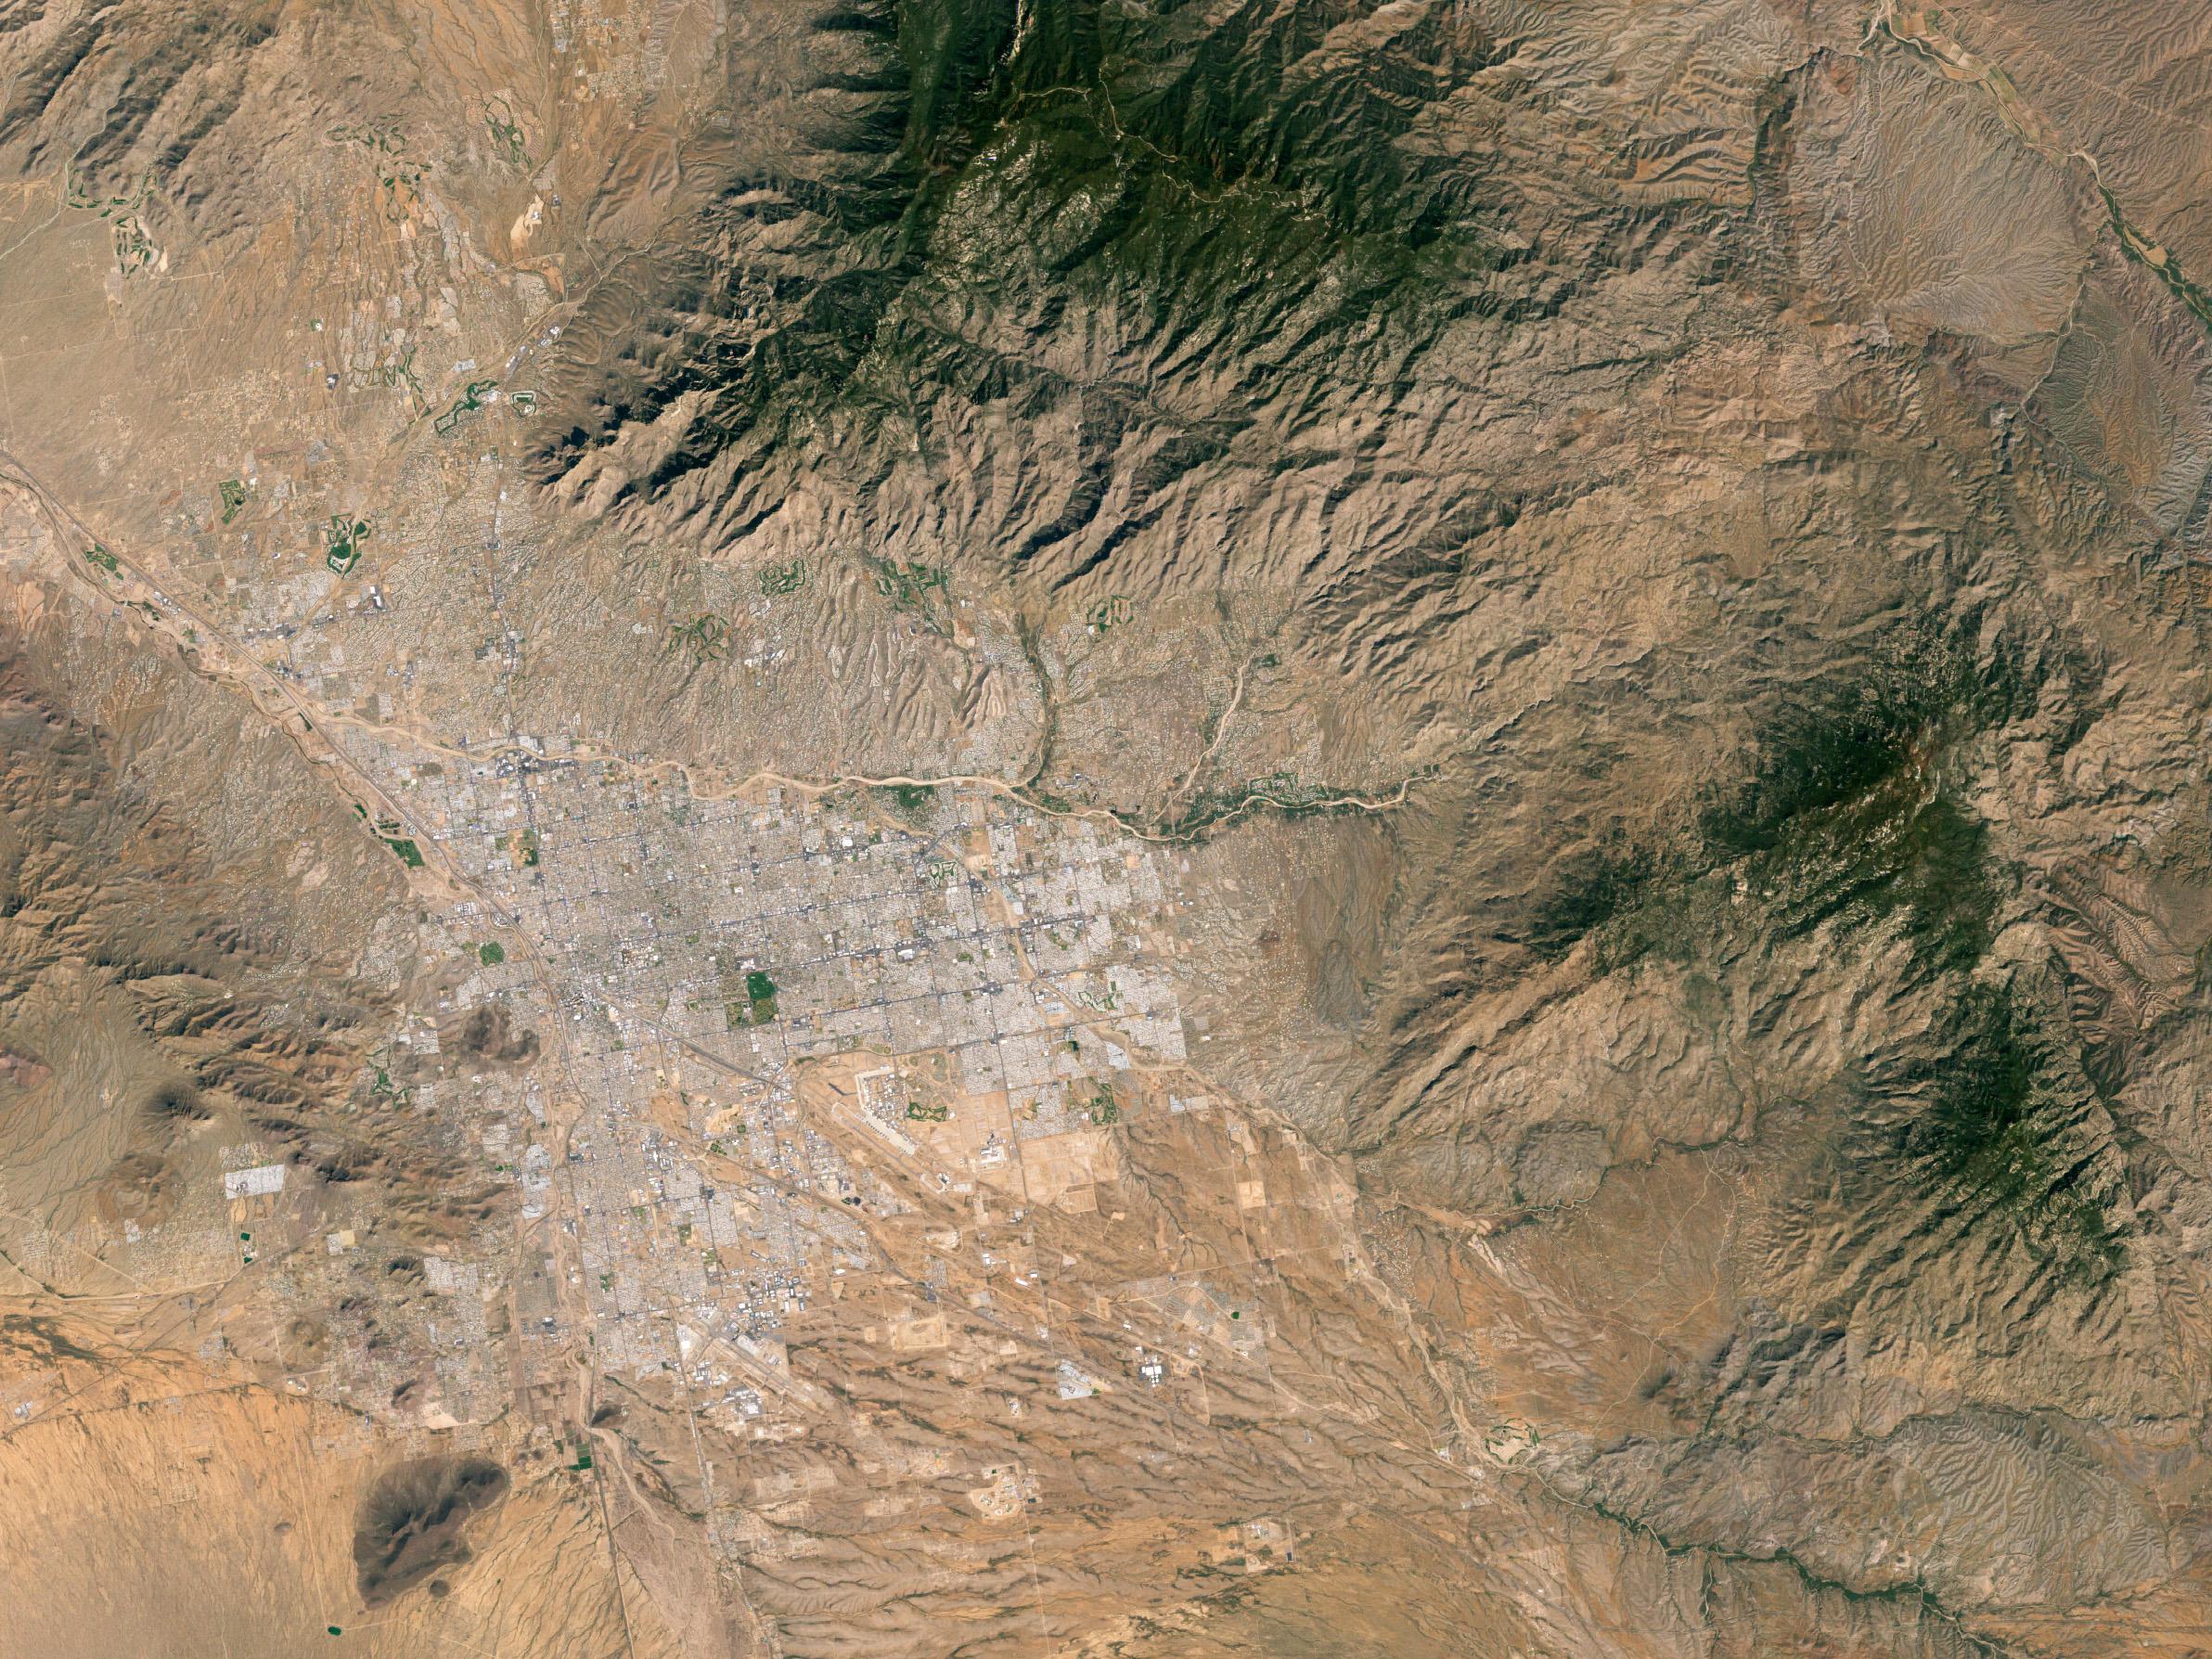 Arizona Cactus Information